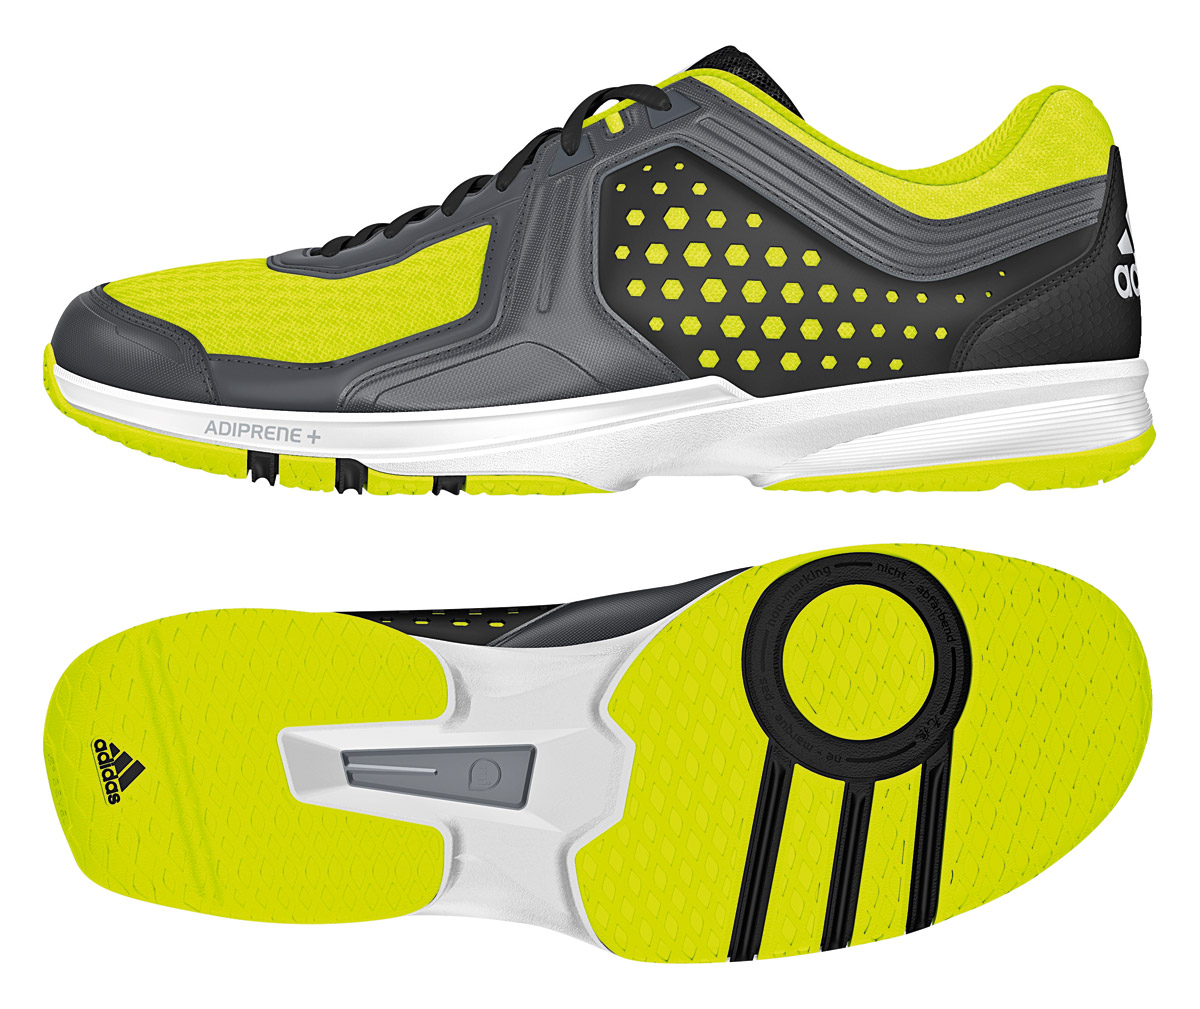 adidas handballschuhe adizero cc7 gr n helvetiq. Black Bedroom Furniture Sets. Home Design Ideas